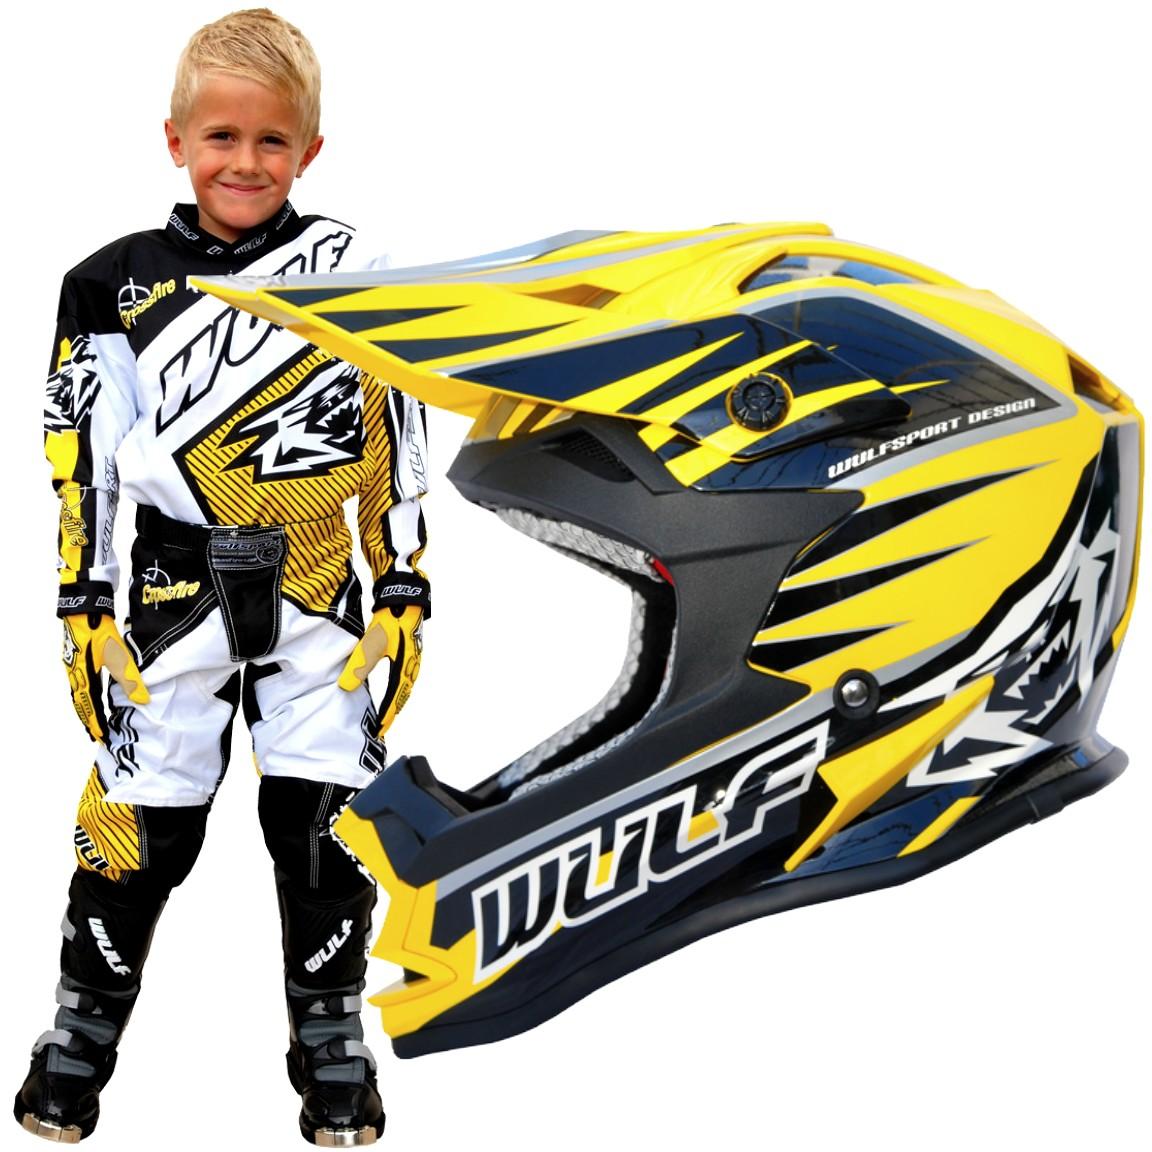 Equipement B Cross Quad B Casques Moto Cross Adulte Enfant